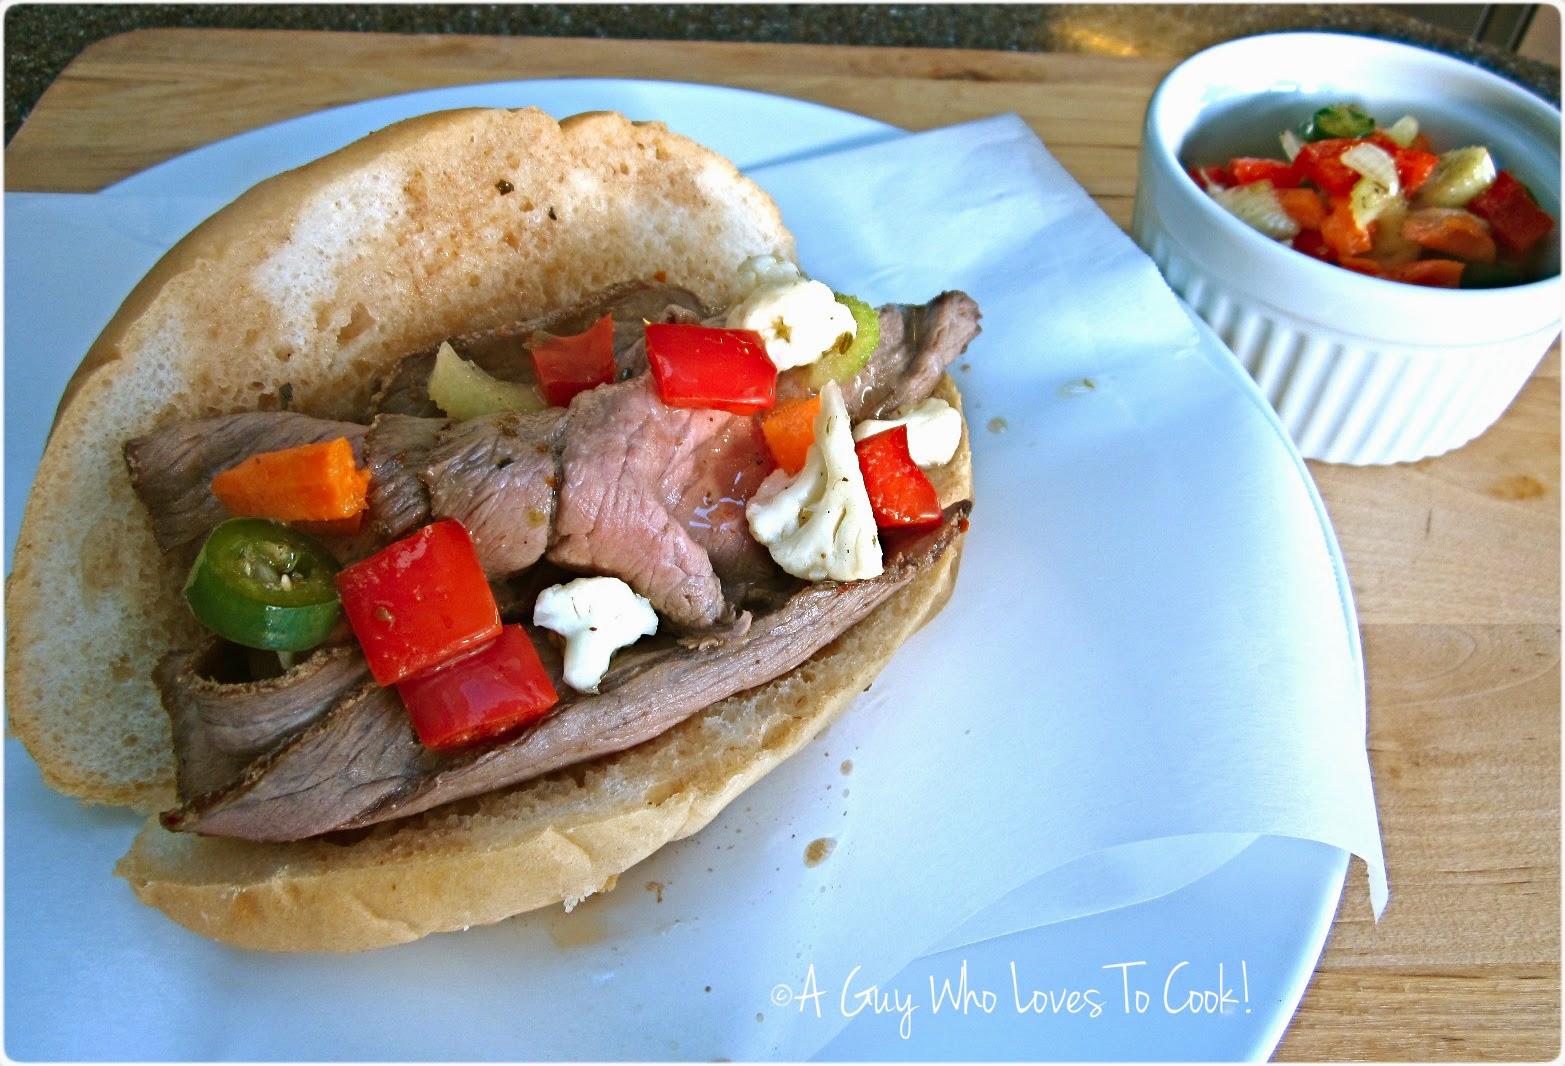 Italian Beef Sandwich - Chicago Style